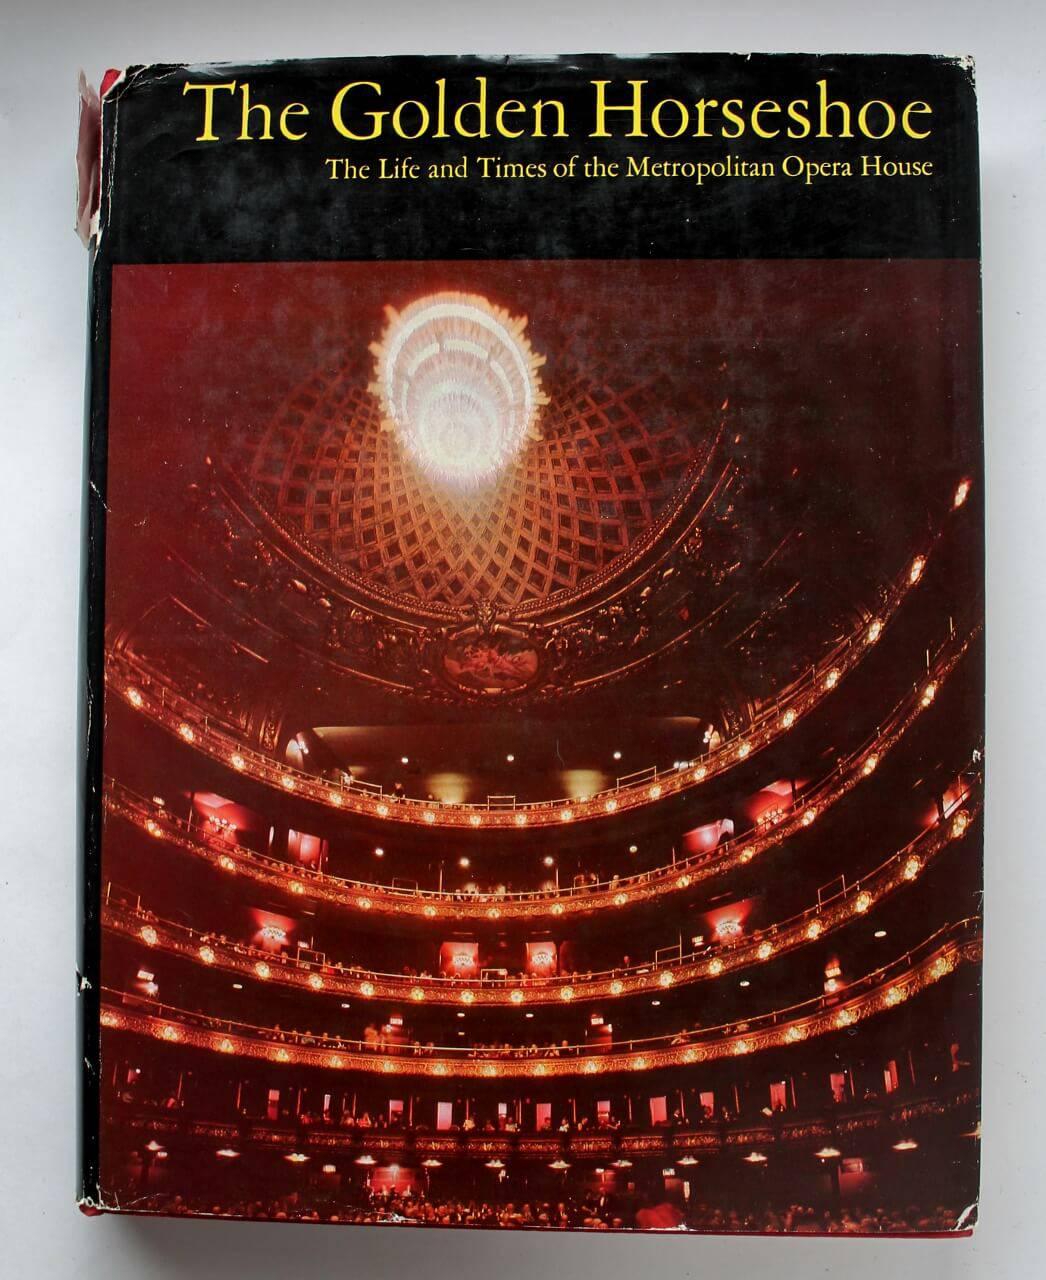 The Book, The Golden Horseshoe: The Metropolitan Opera House